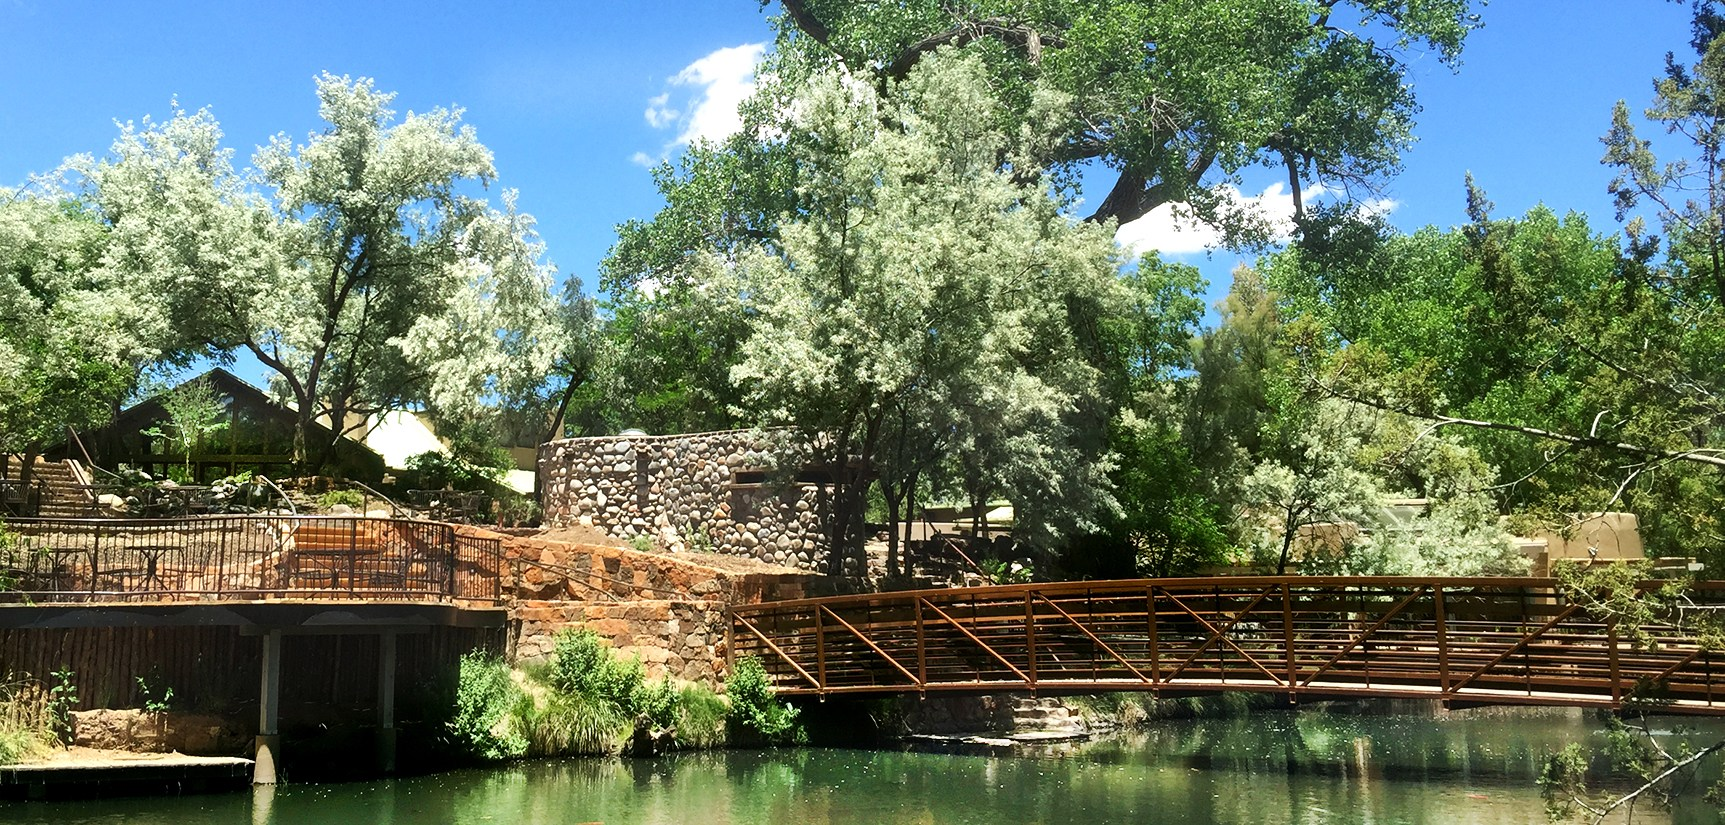 Sunrise Springs Spa Resort: Santa Fe, New Mexico - https://sunrisesprings.ojospa.com